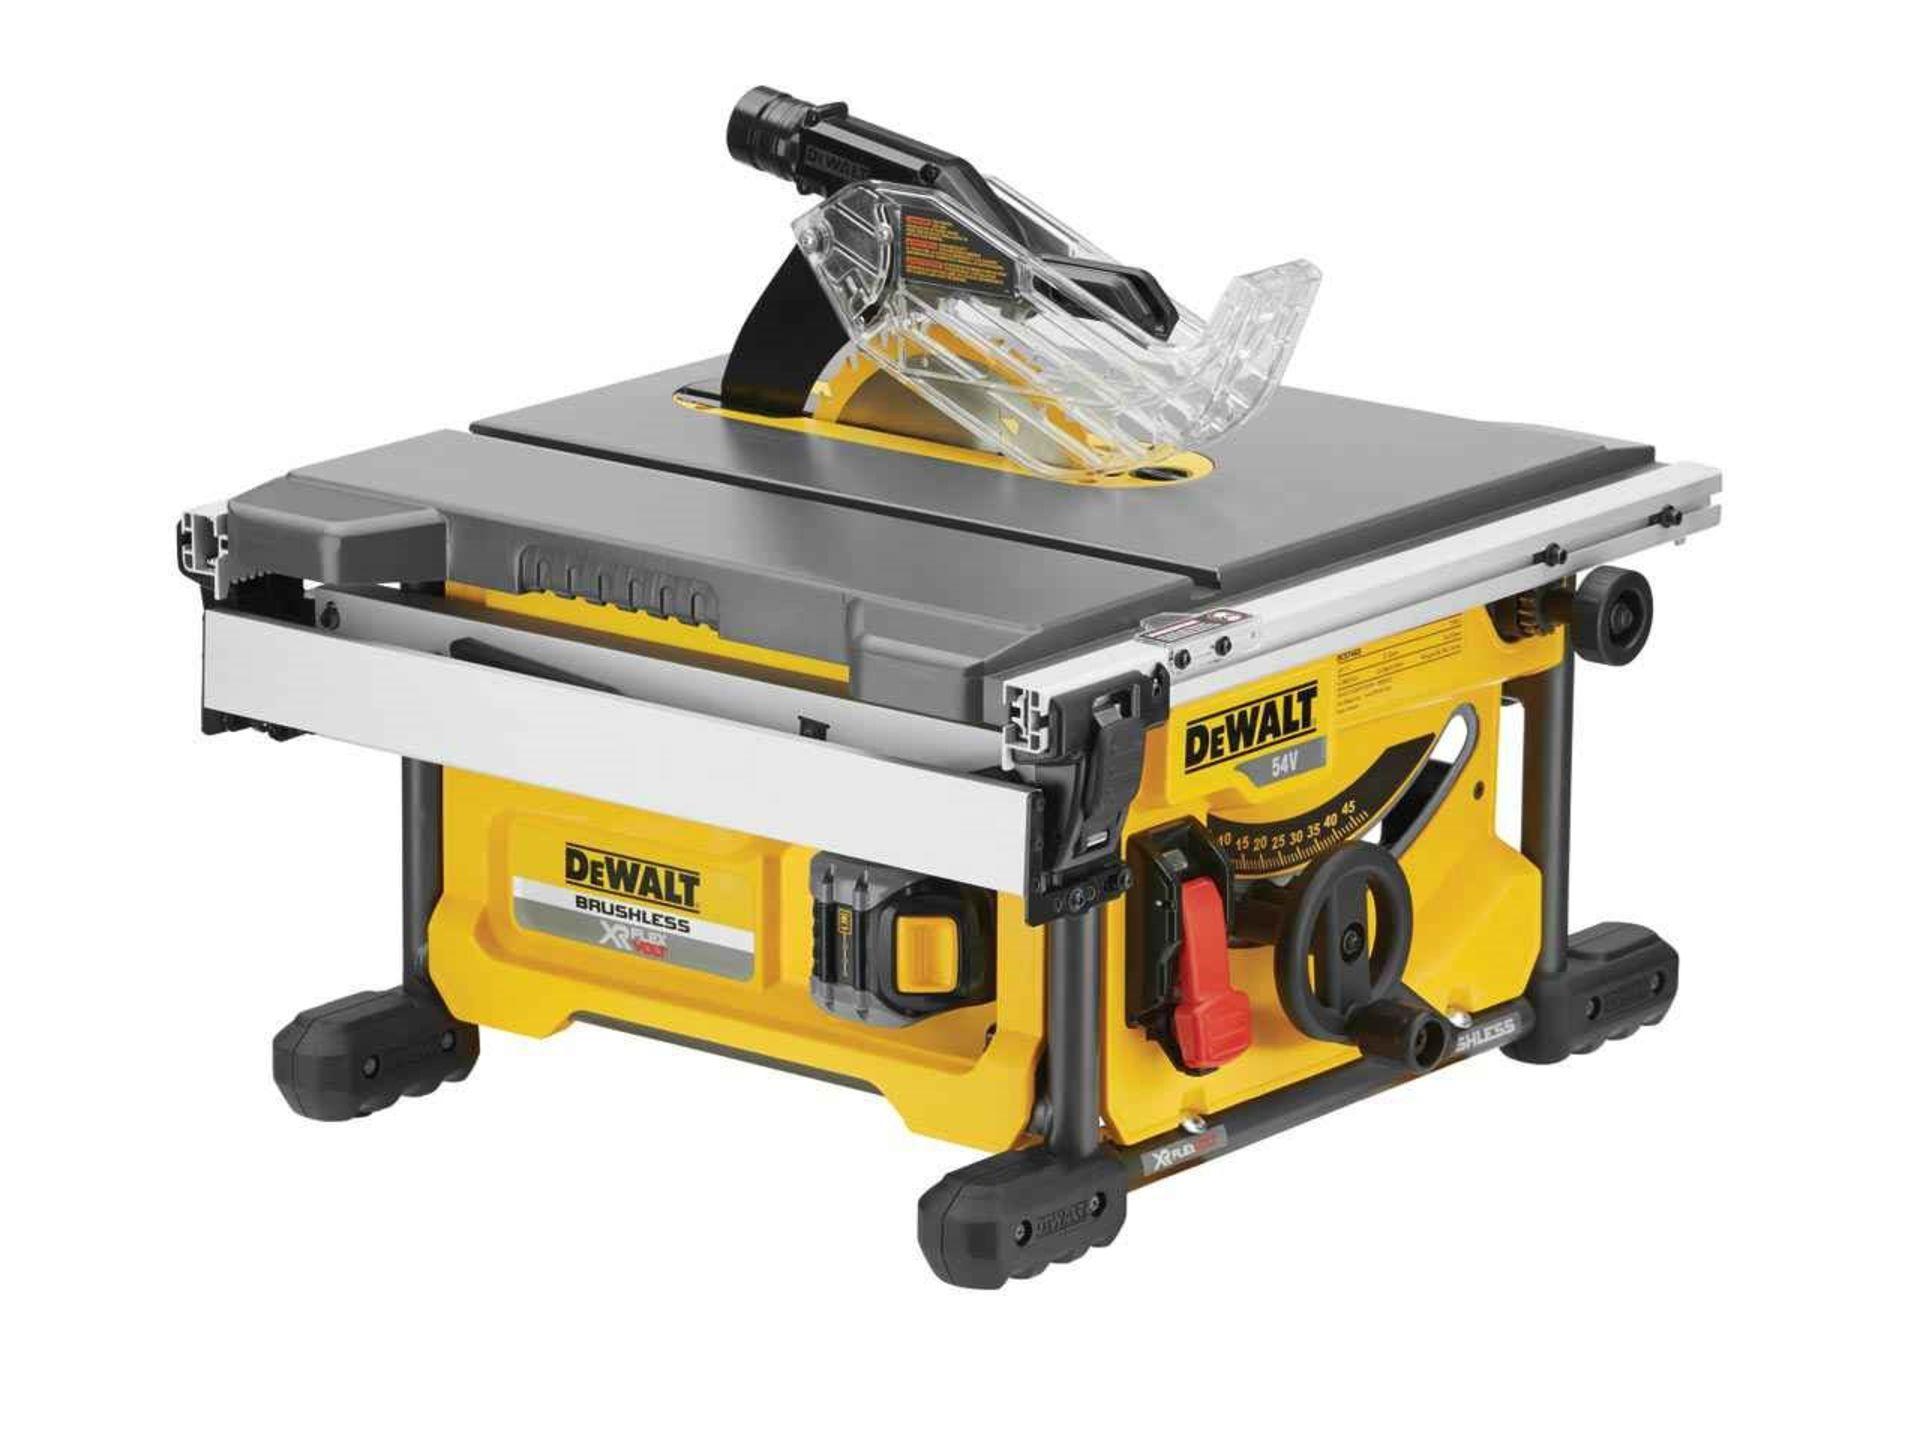 Lot 10089 - V Brand New DeWalt DCS7485 54V XR Flex Volt Brushless Cordless Table Saw £434.97 (Amazon)